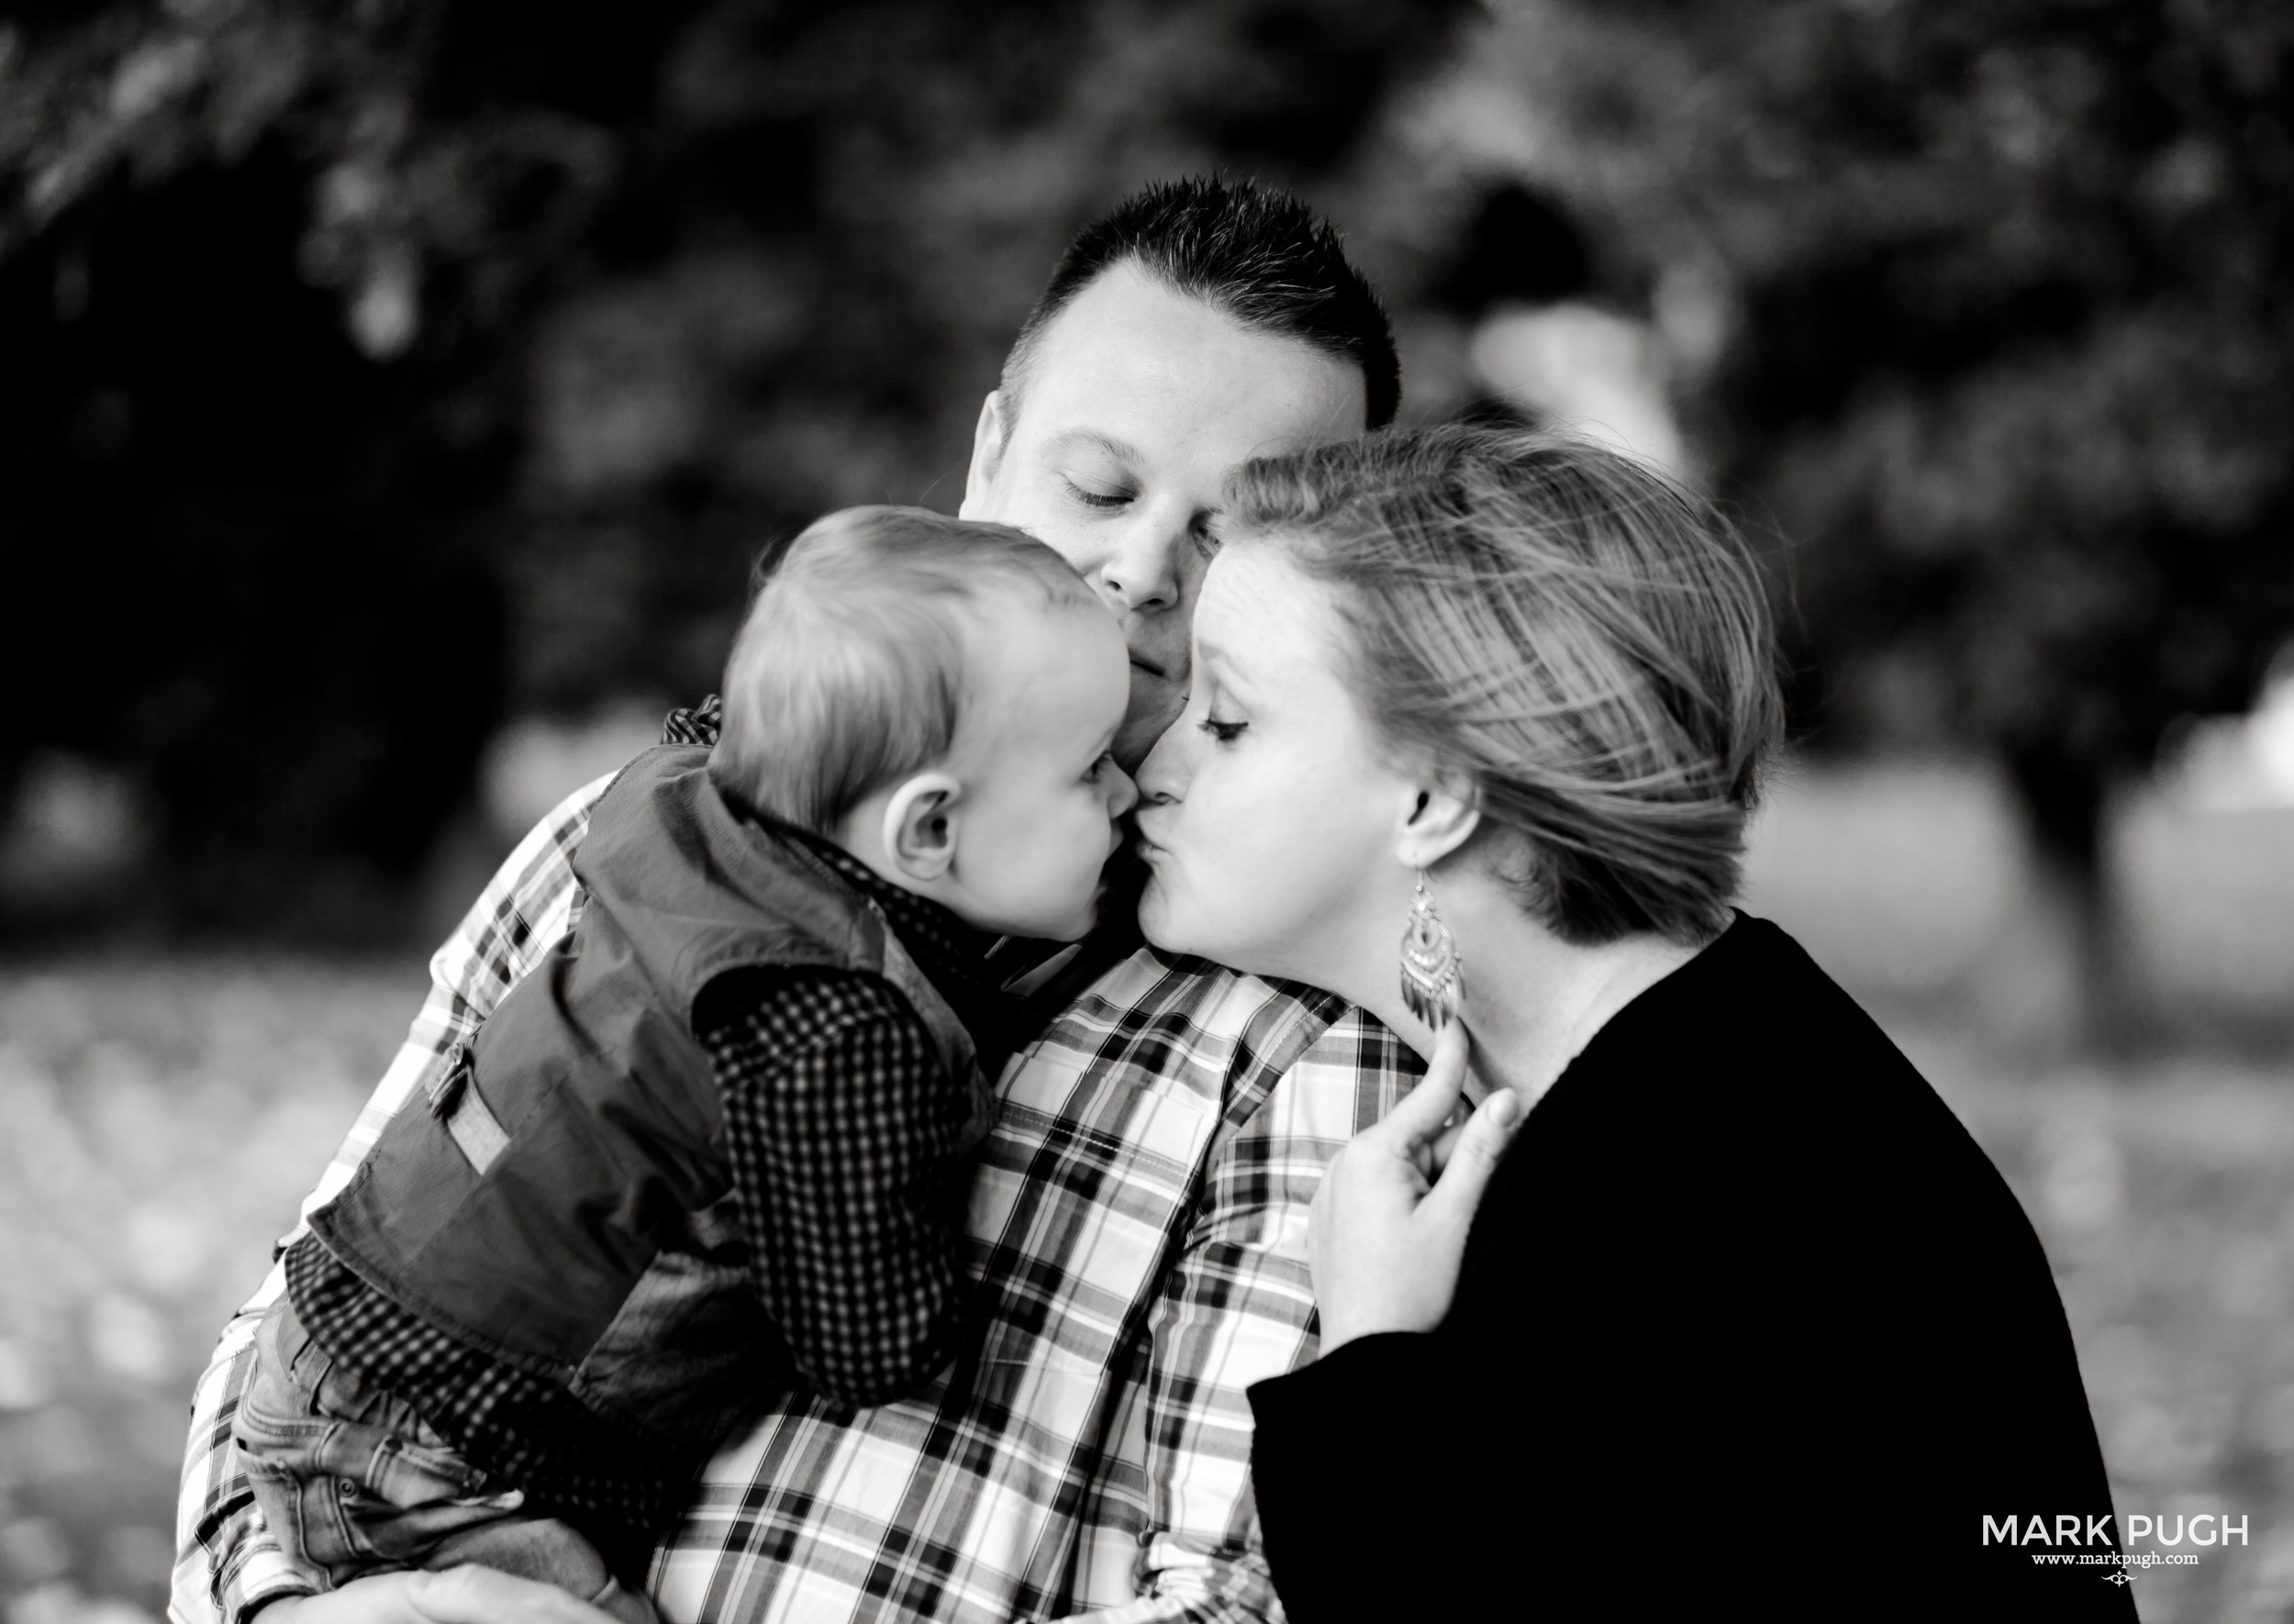 006 - Lisa Craig and Jackson - Family Photography by Mark Pugh www.markpugh.com.jpg